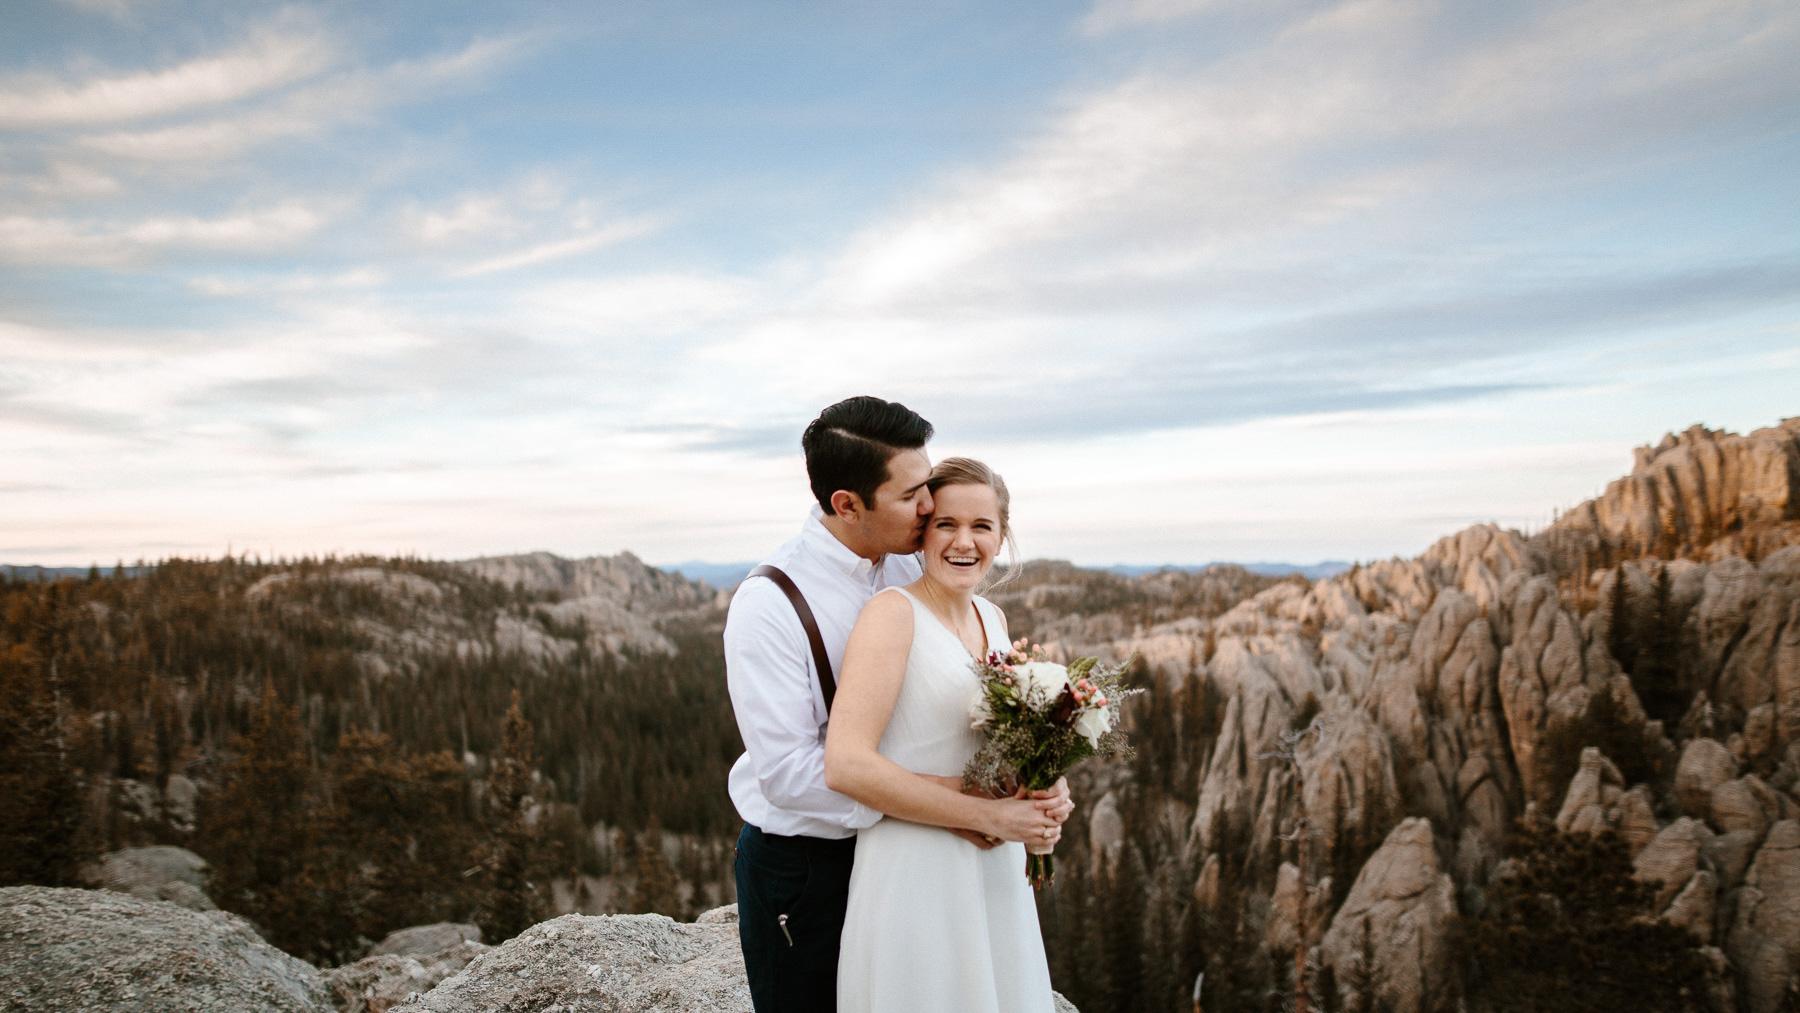 sioux-falls-black-hills-rapid-city-elopement-wedding-adventure-photographer-custer-sylvan-lake-51.jpg